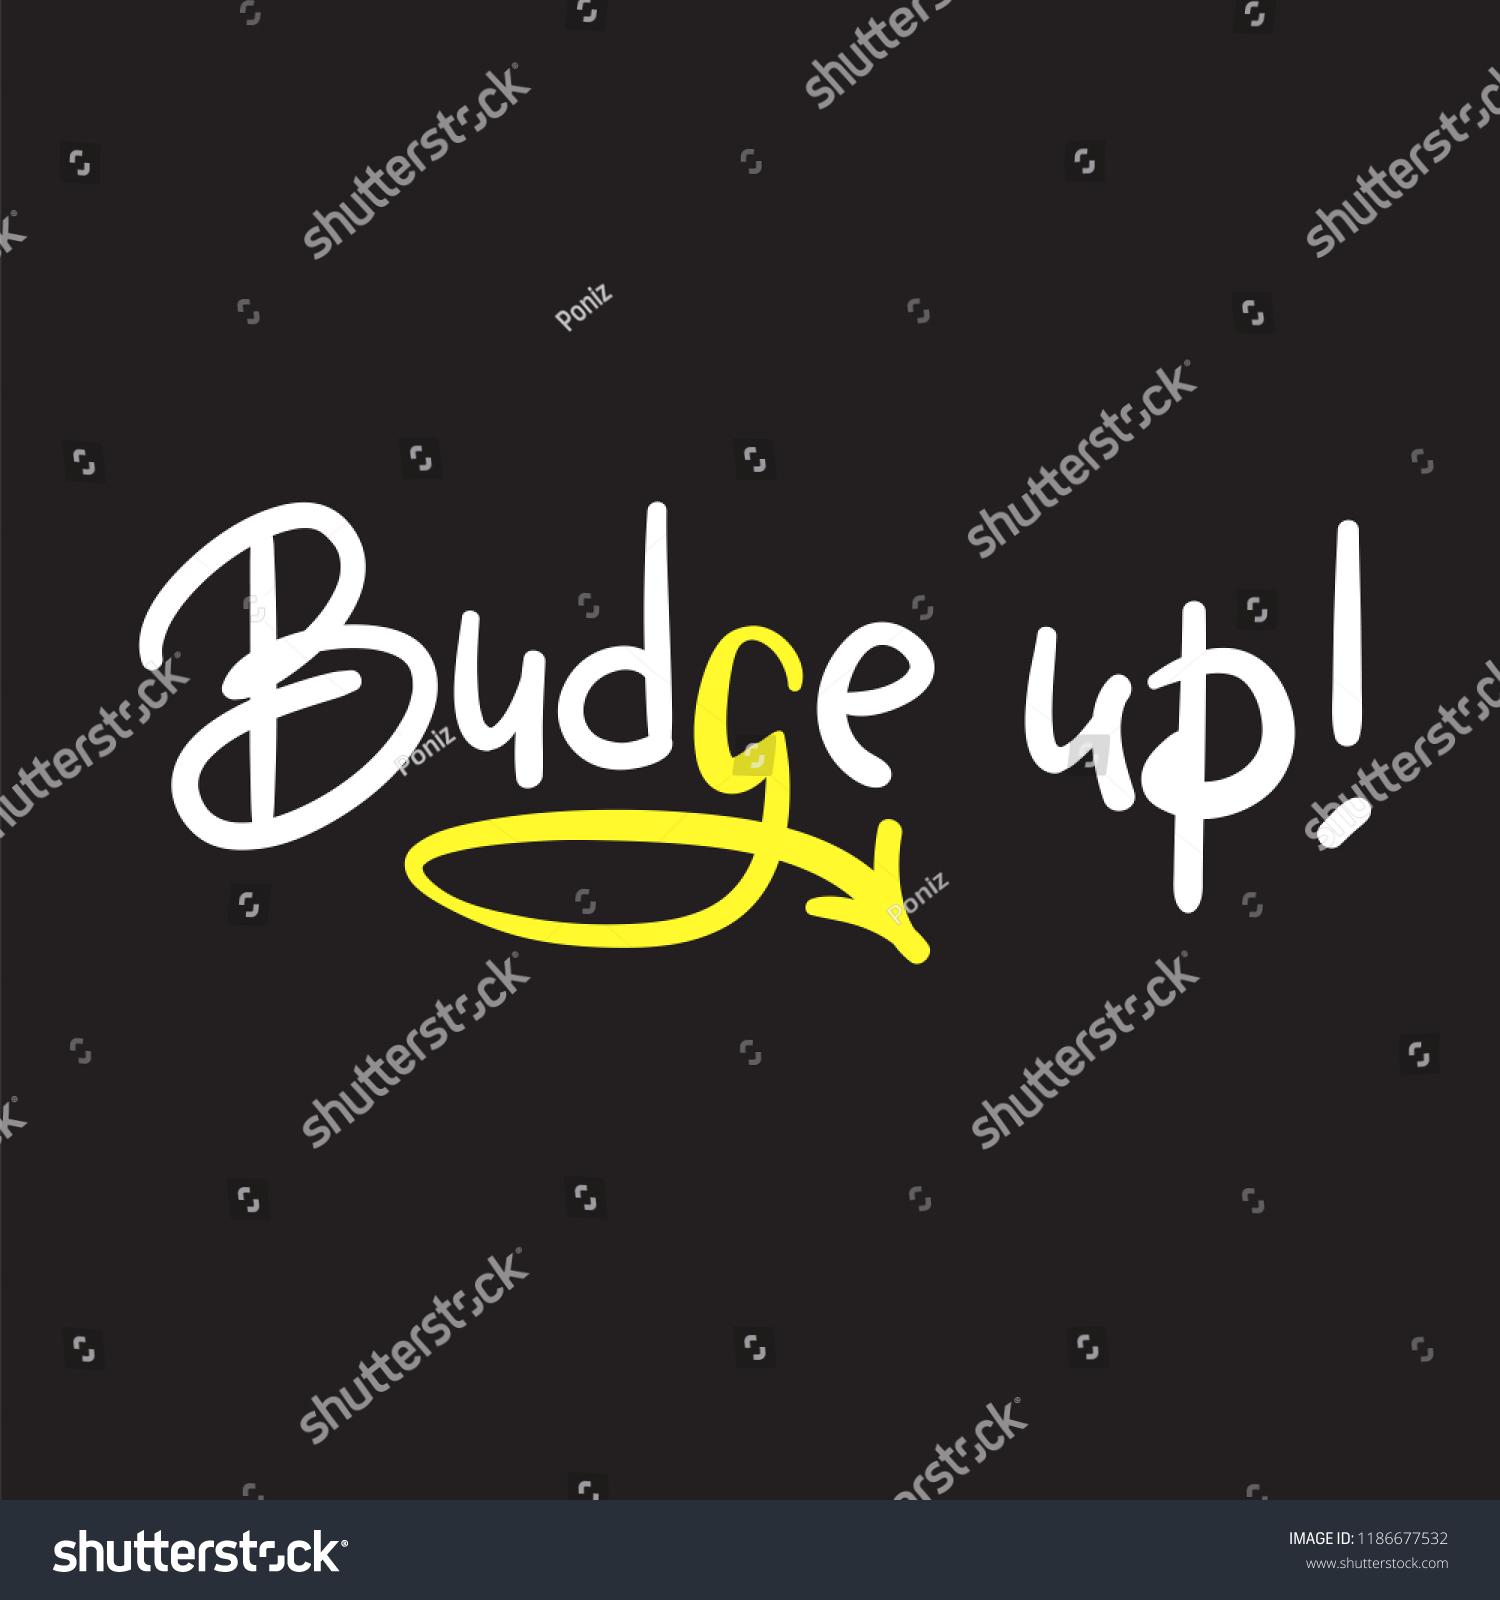 Budge Emotional Handwritten Quote American Slang Stock Vector